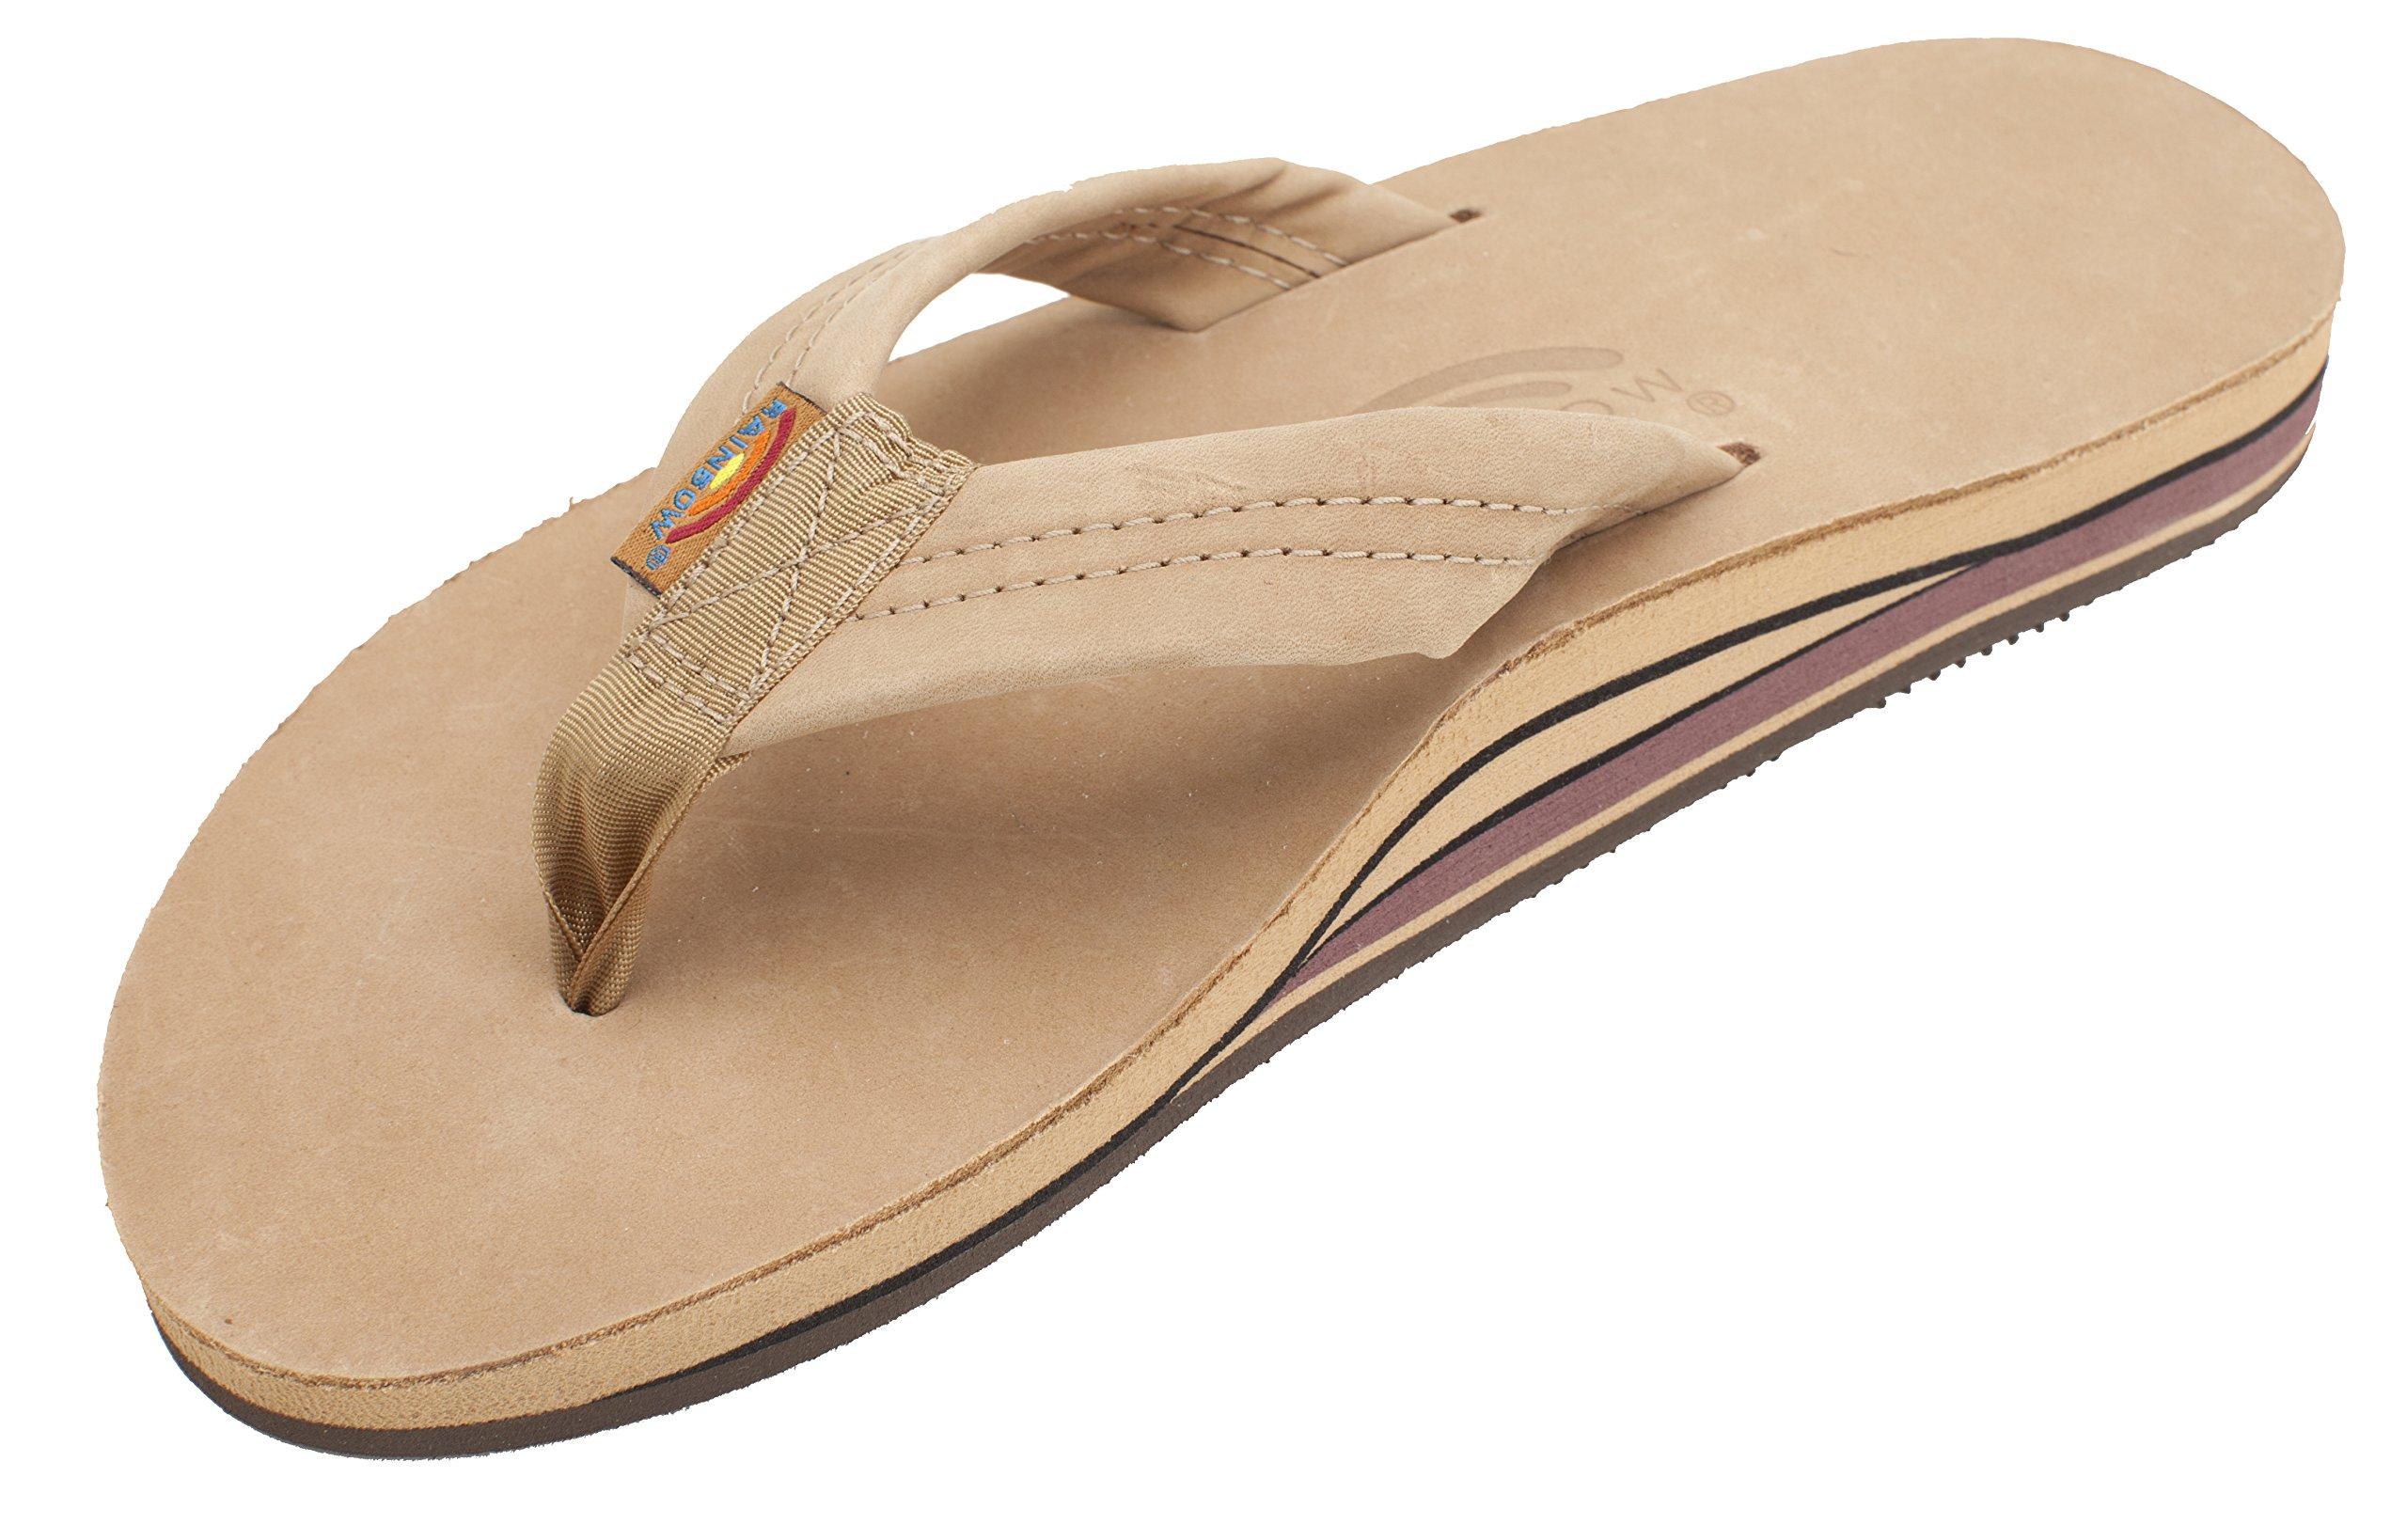 Rainbow Sandals Men Premium Leather Double Layer, Sierra Brown, X-Large (11-12)